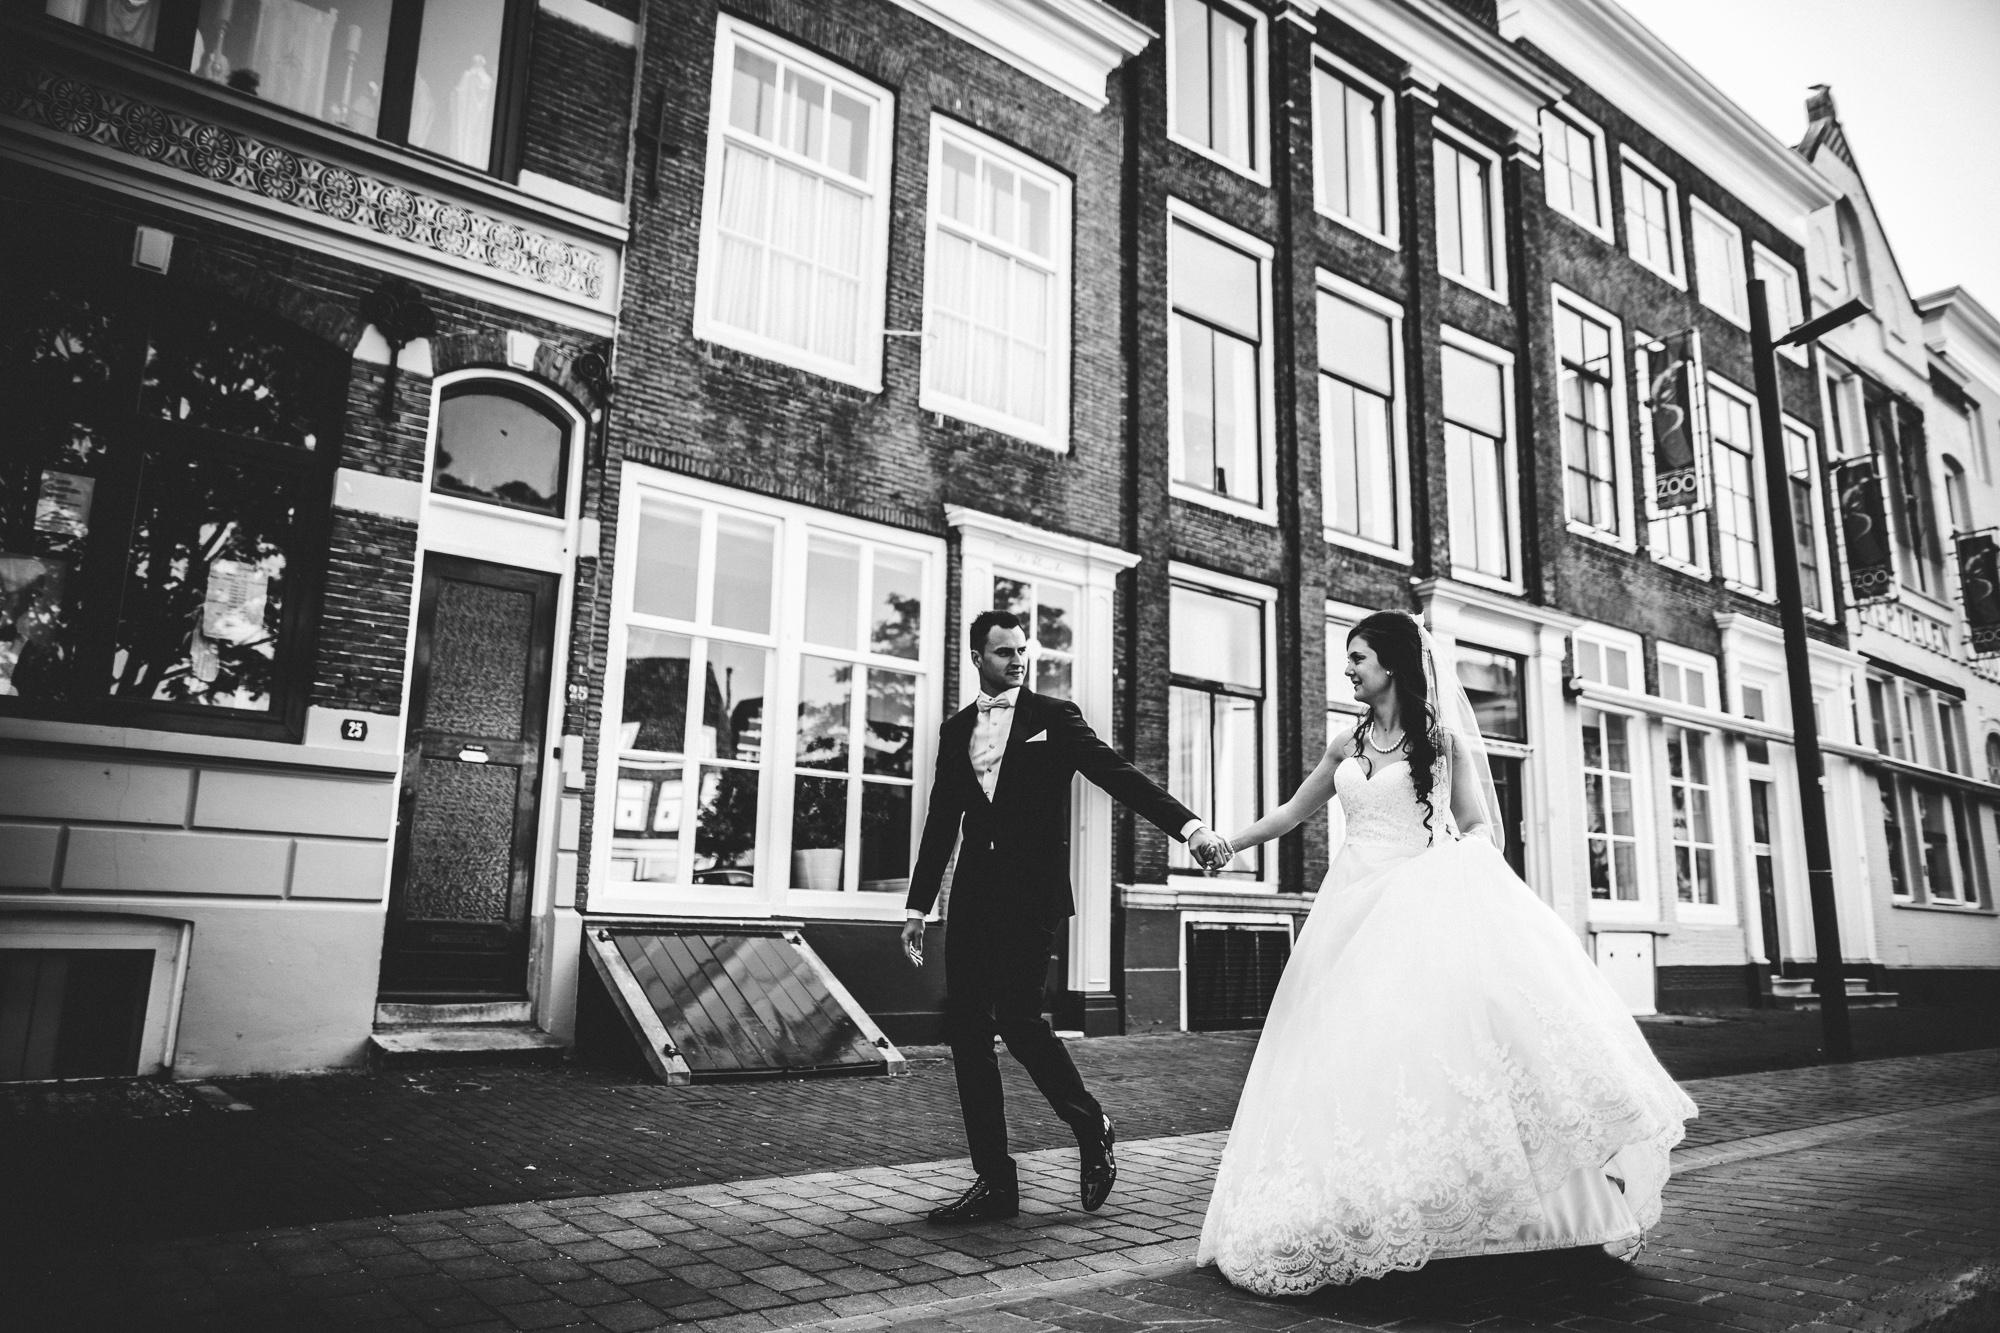 after wedding ia 023 - Afterwedding in Zeeland / Holland